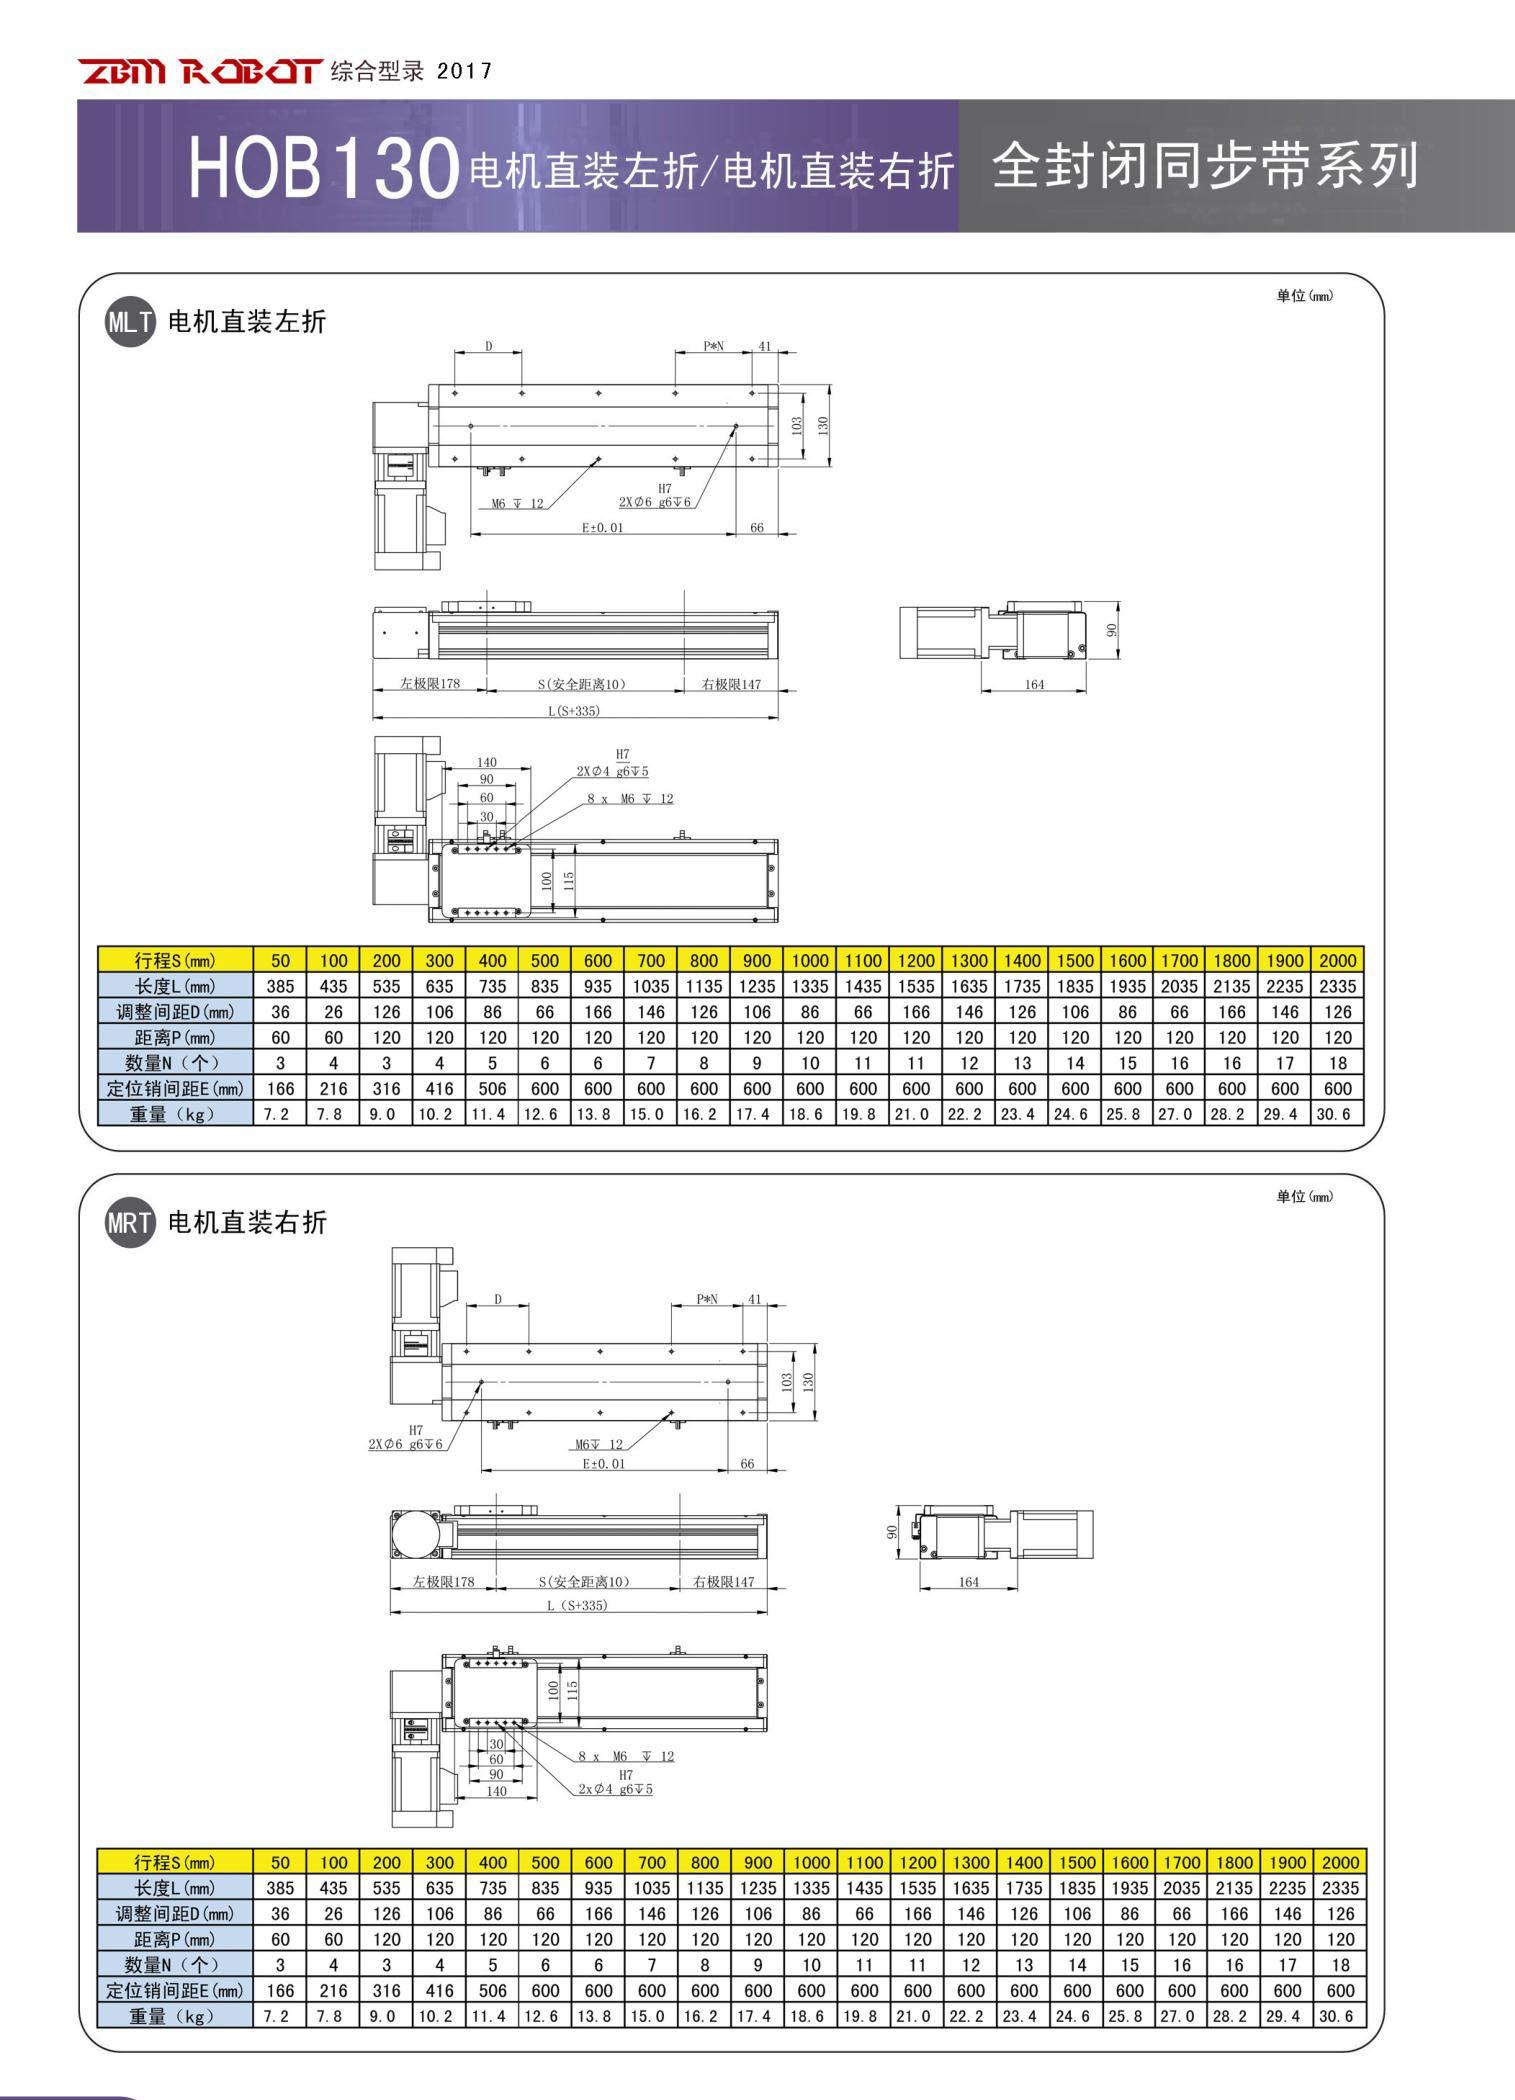 HOB130B-CR|全封闭皮带模组-深圳市桃花成视频人app智能装备有限公司